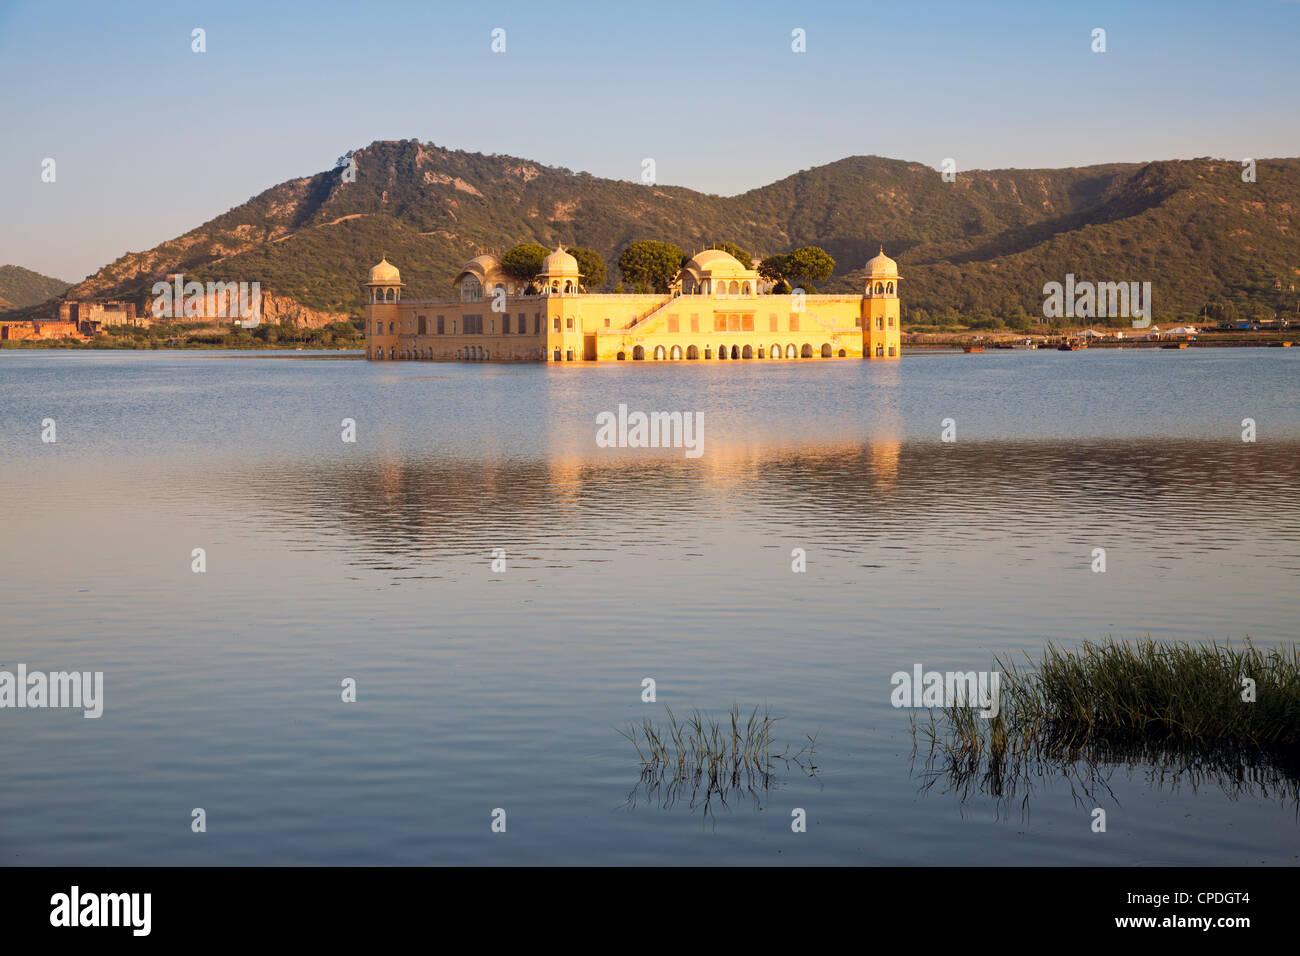 Le Jai Mahal (palais de lac), Jaipur, Rajasthan, Inde Photo Stock